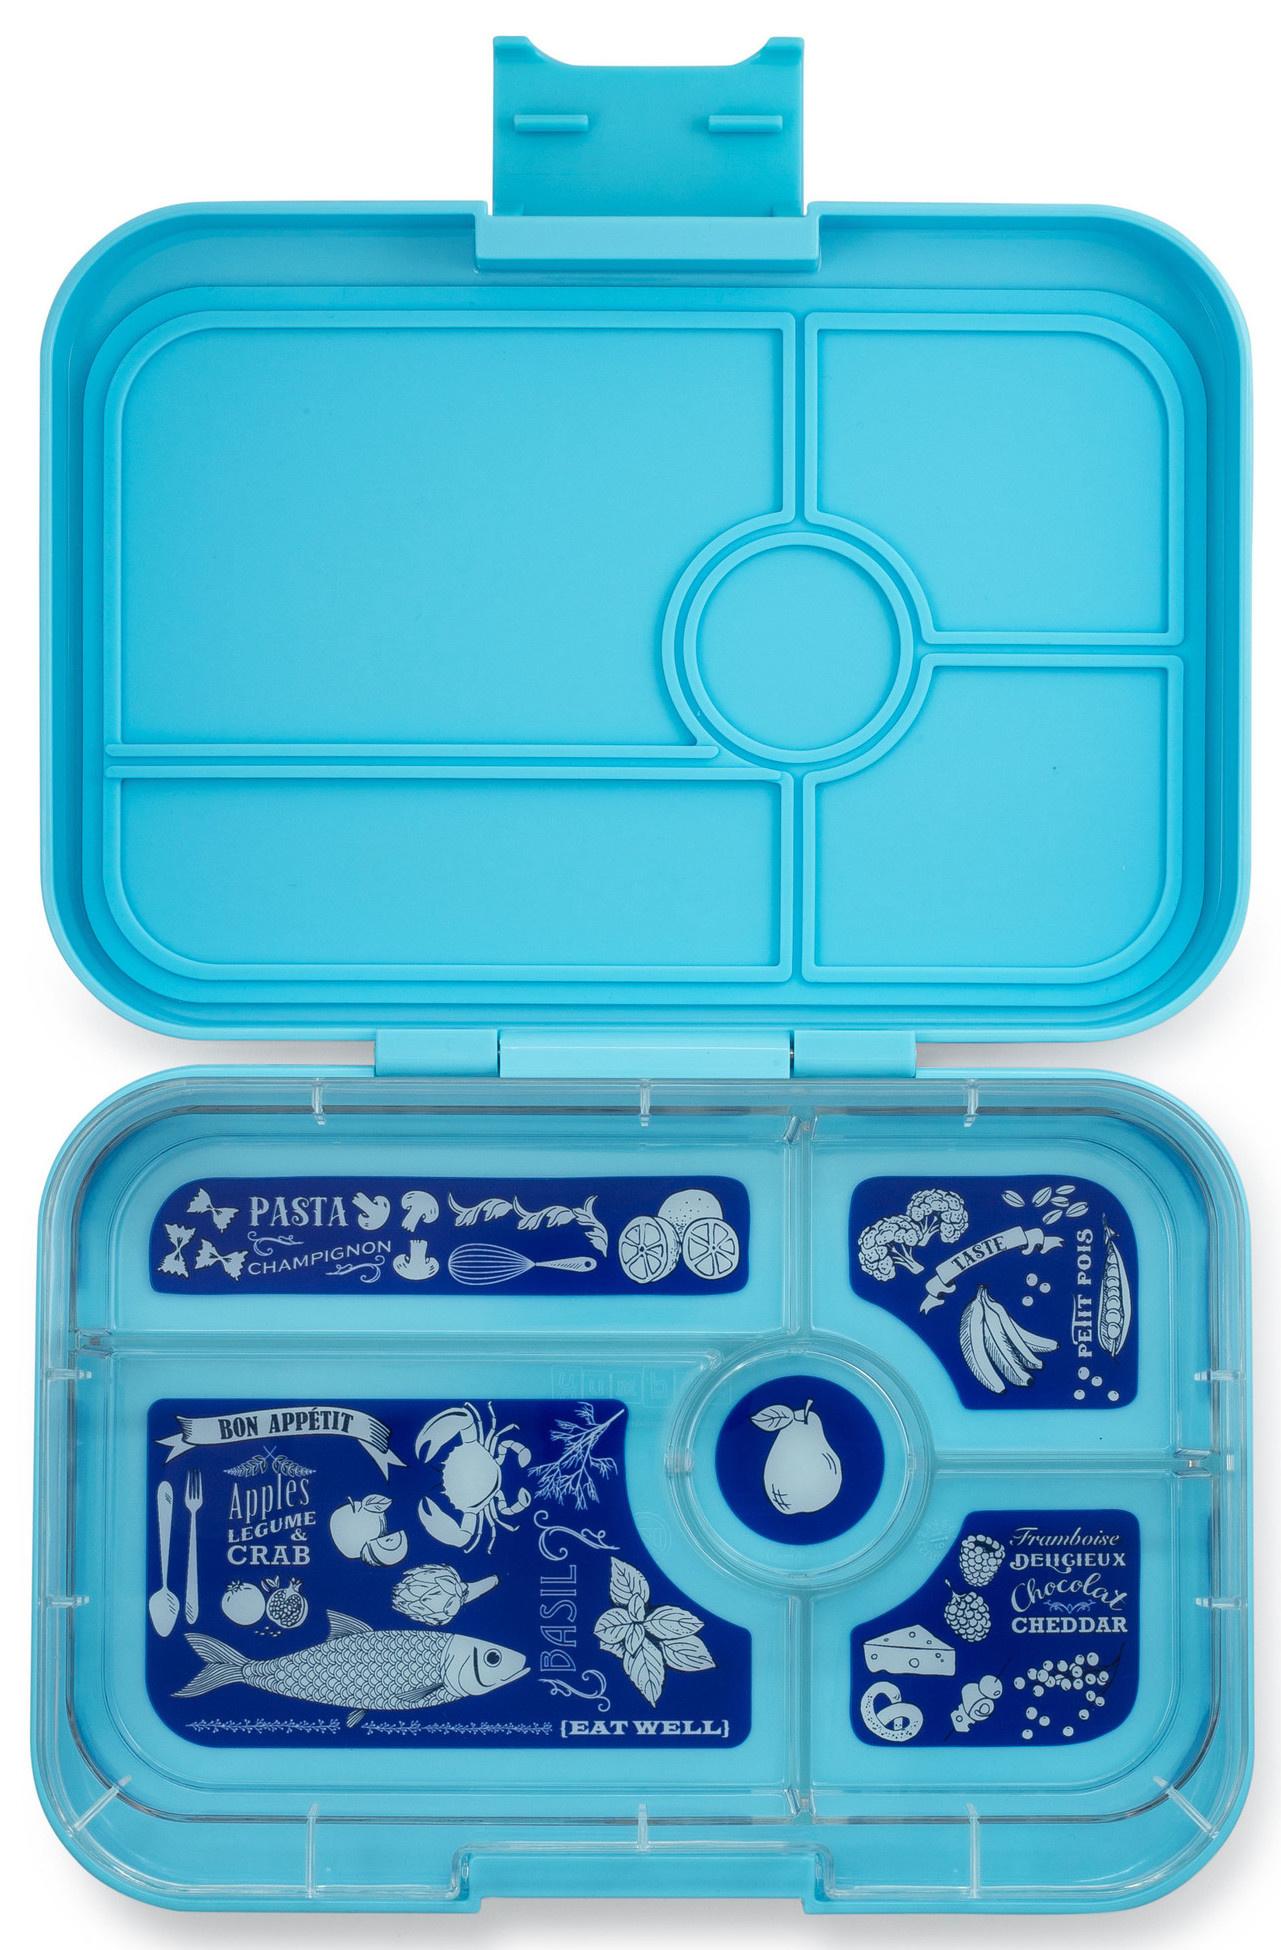 Yumbox Tapas XL lunchbox Nevis blue / Bon appetit tray 5-sections-1